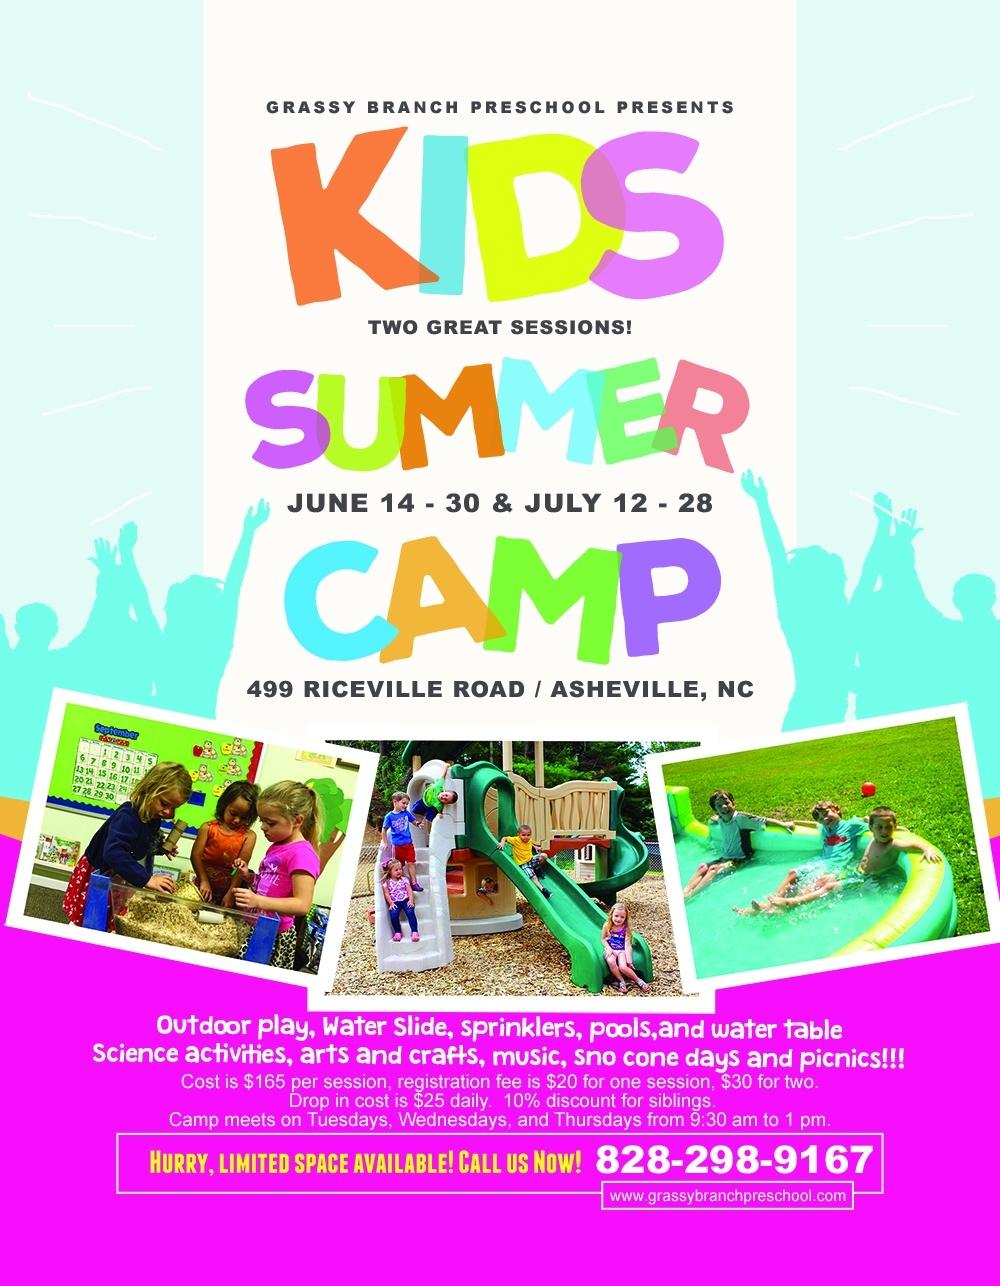 Summer Camp 2016 – Grassy Branch Preschool  Daily Summer Activities For Preschoolers